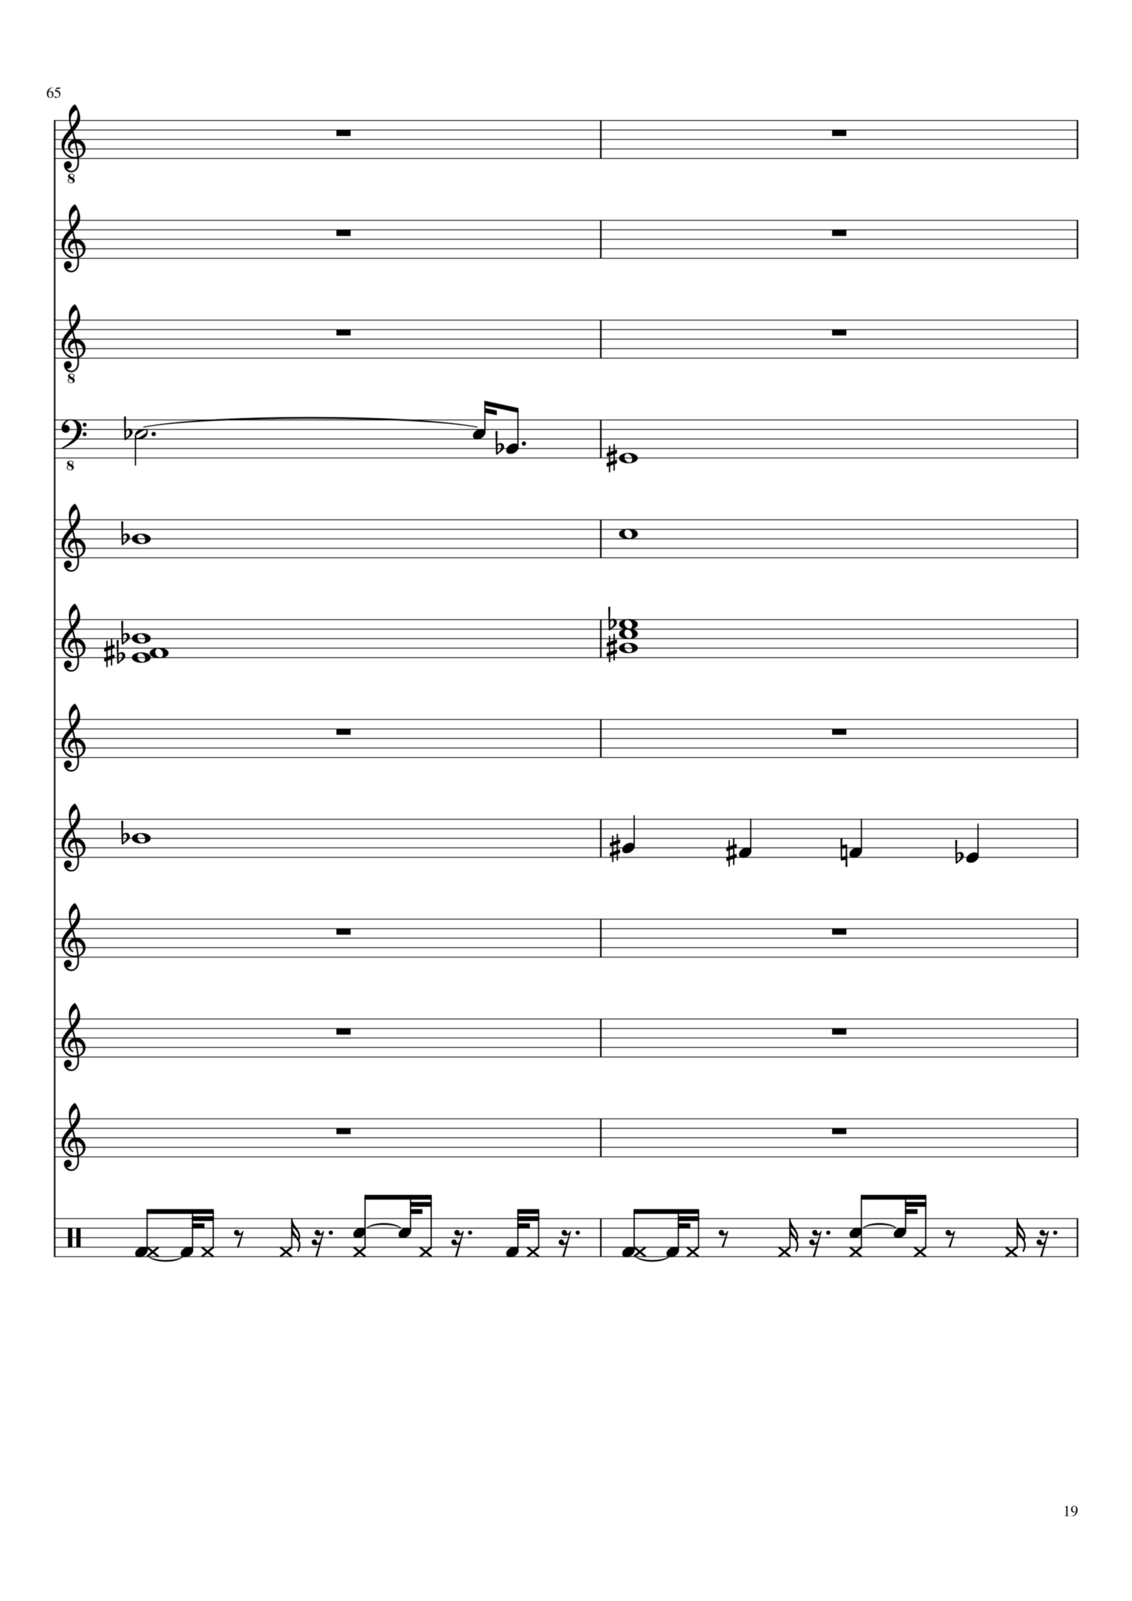 Prosti slide, Image 19